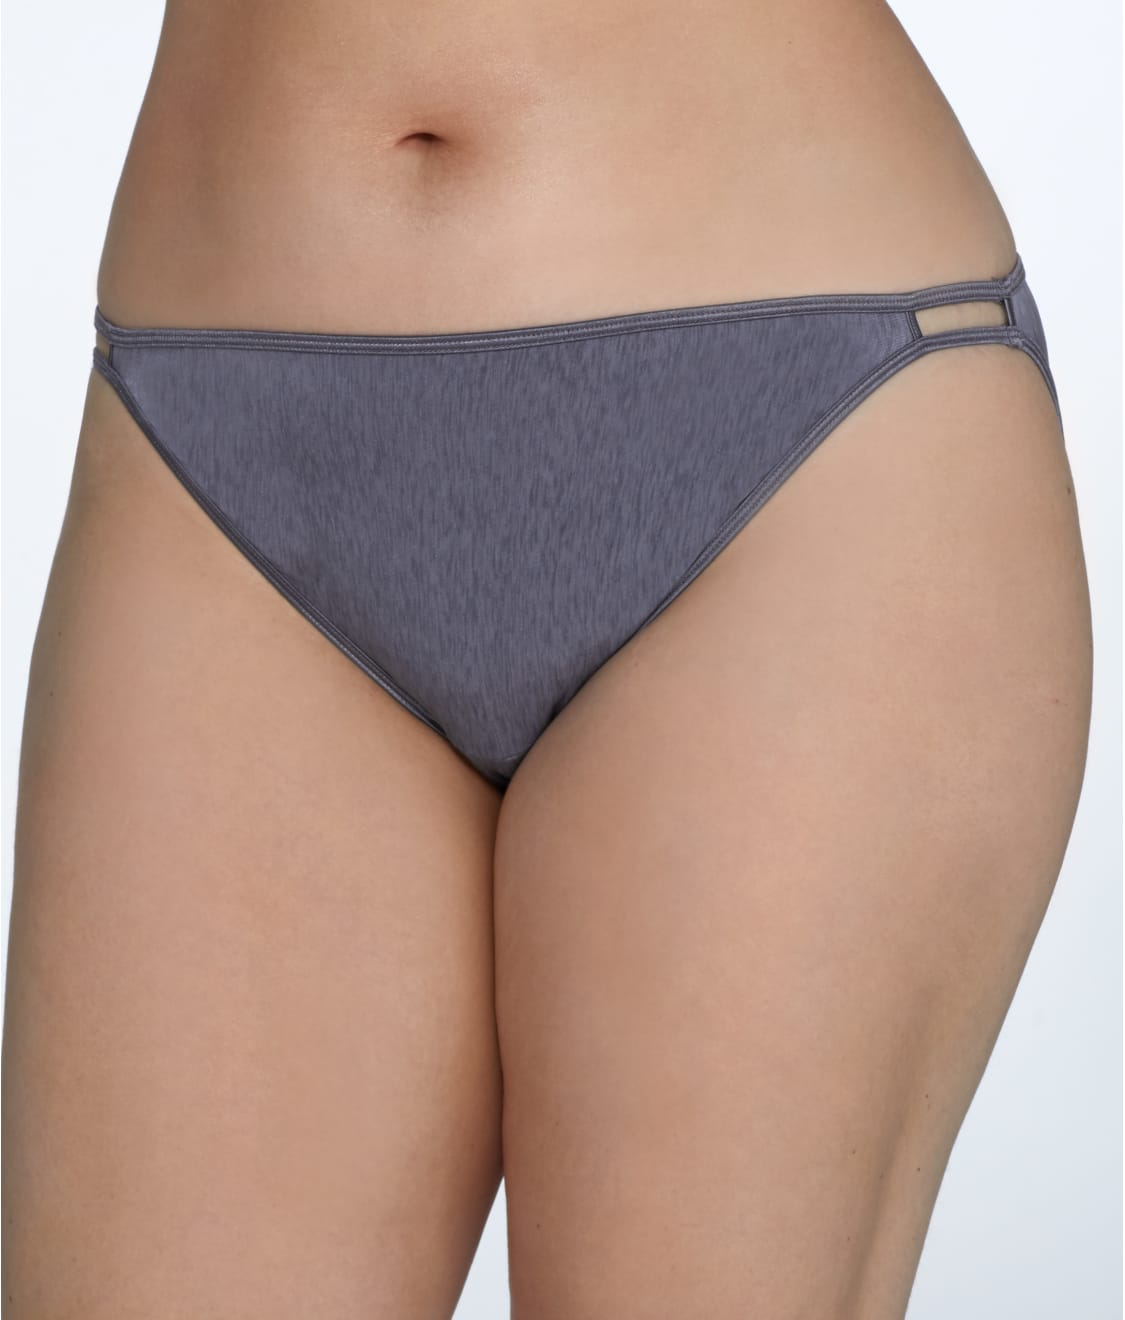 7abe2a5dd00d Vanity Fair Plus Size Illumination String Bikini   Bare Necessities ...